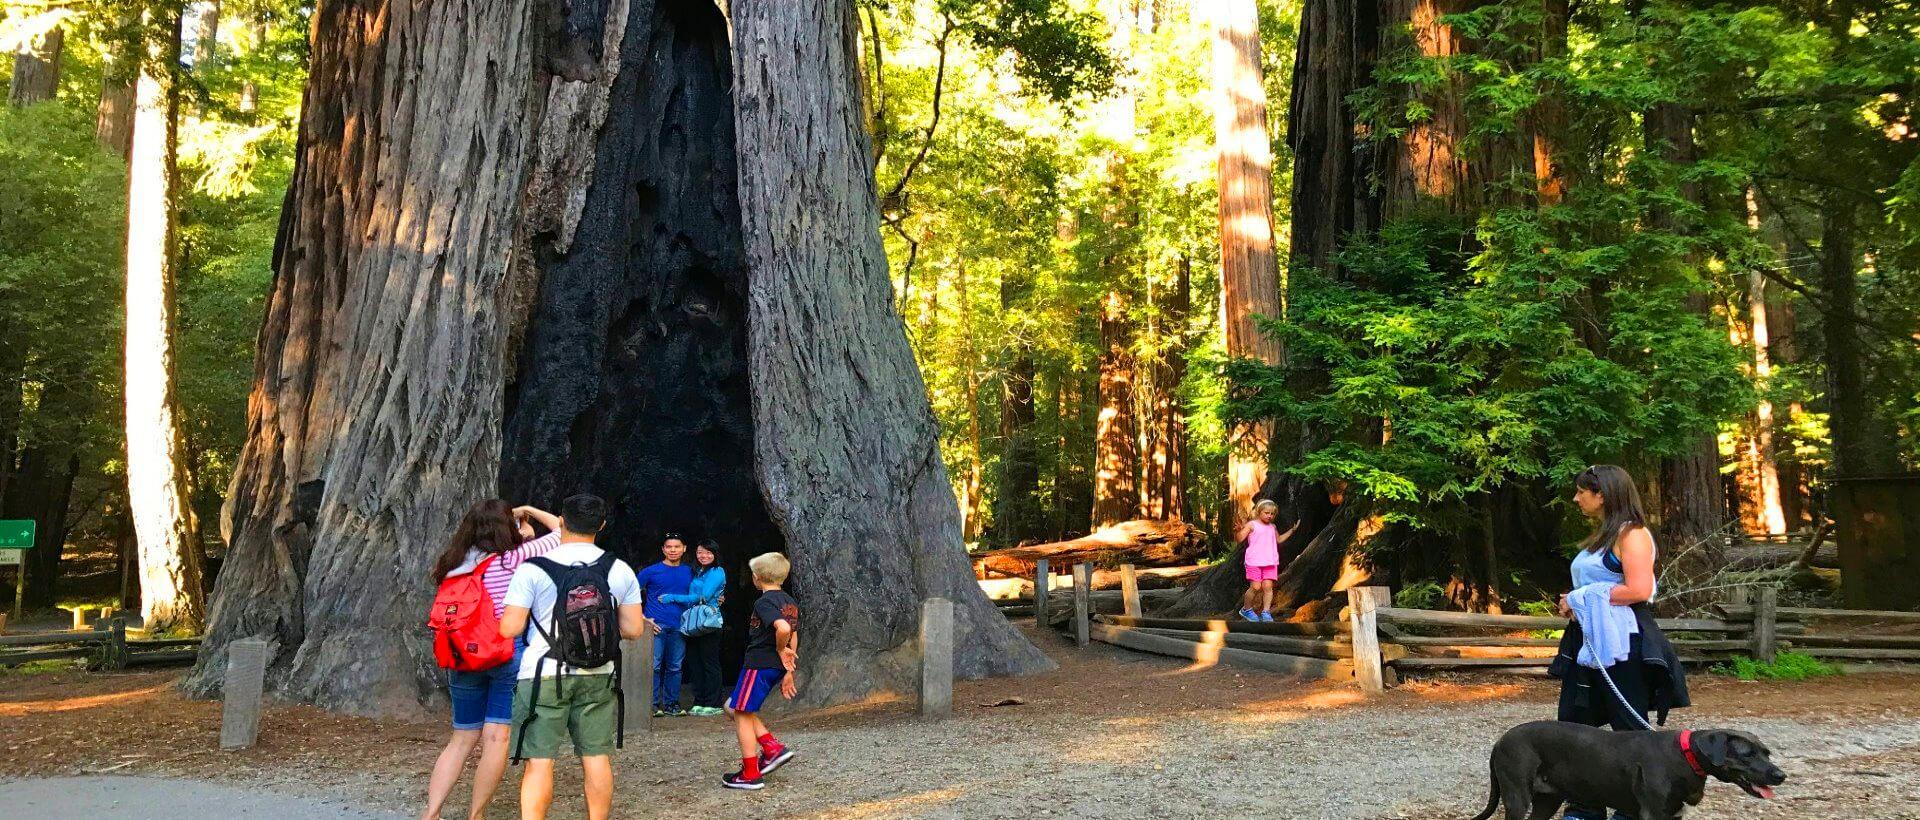 big_basin_redwoods_state_park_and_ssanta_cruz_tour_from_san_francisco